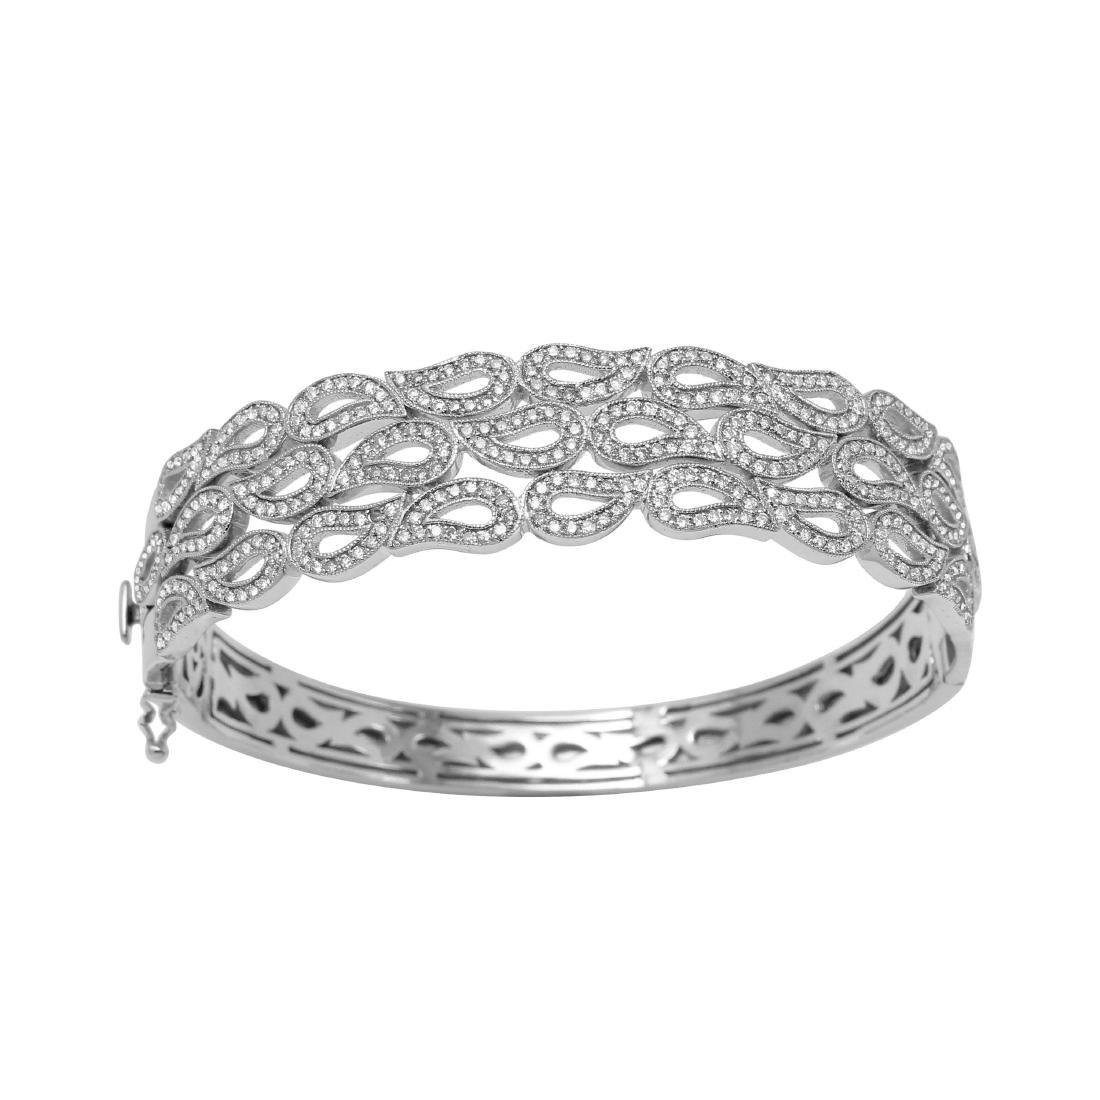 14KT White Gold Diamond Bangle Bracelet - 3